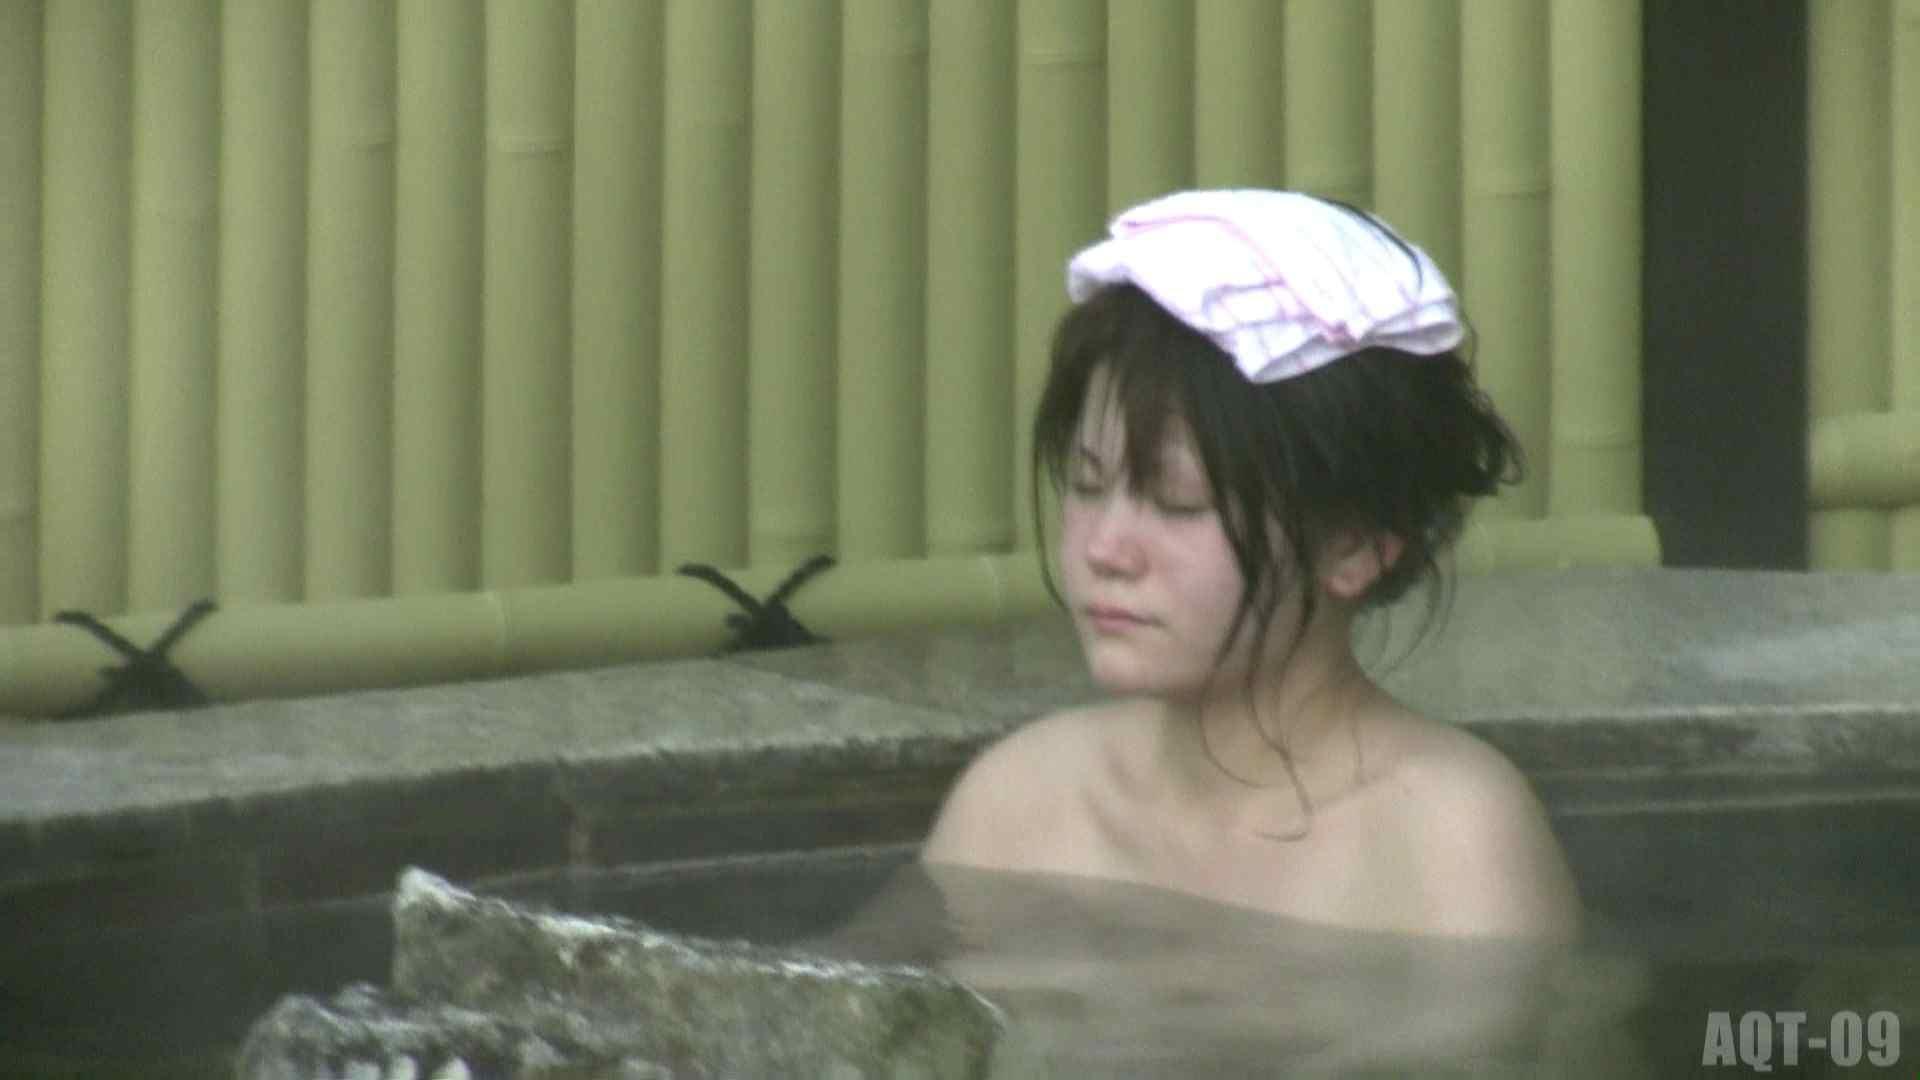 Aquaな露天風呂Vol.789 盗撮シリーズ | 露天風呂編  96PIX 7